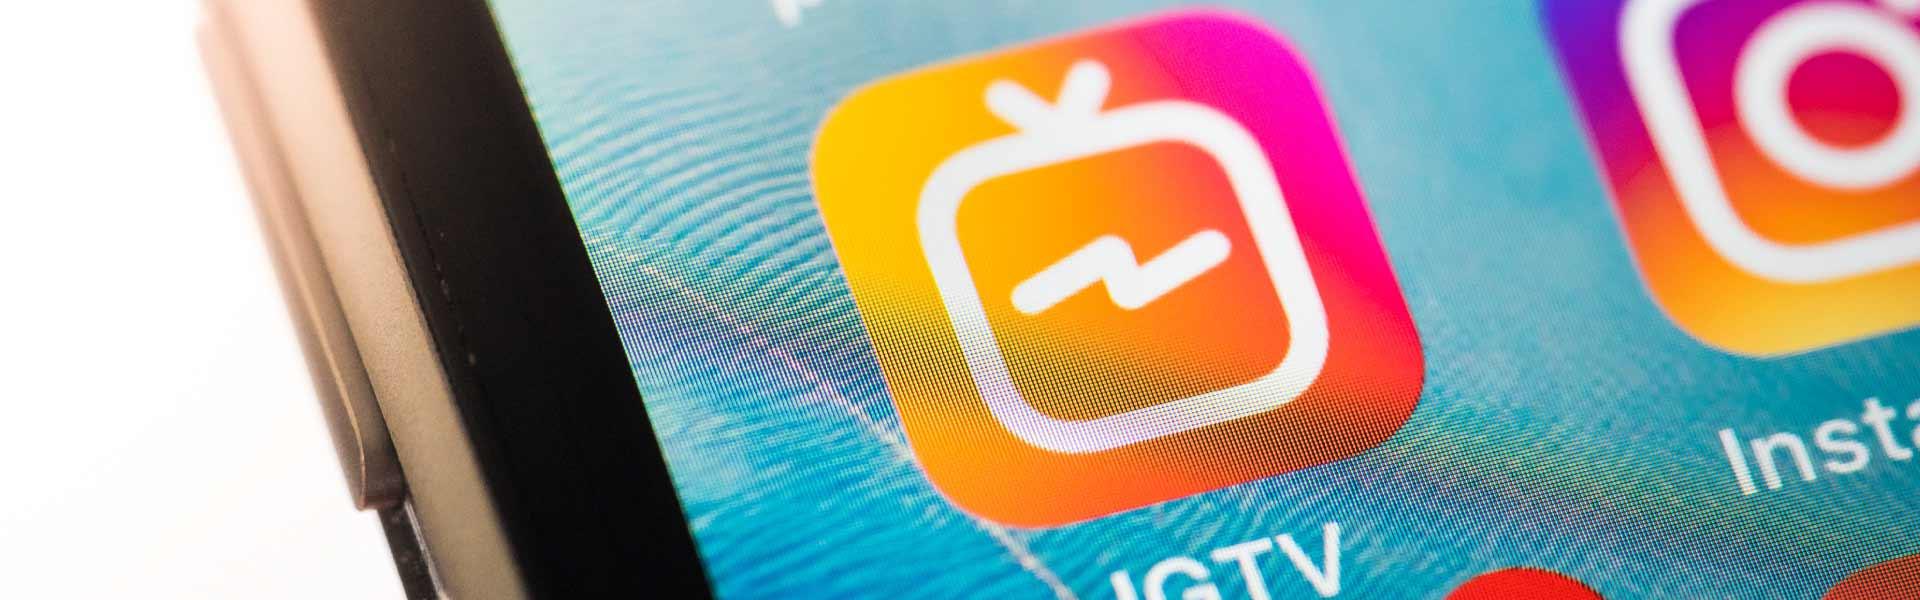 Instagram-Marketing-IGTV-introductie